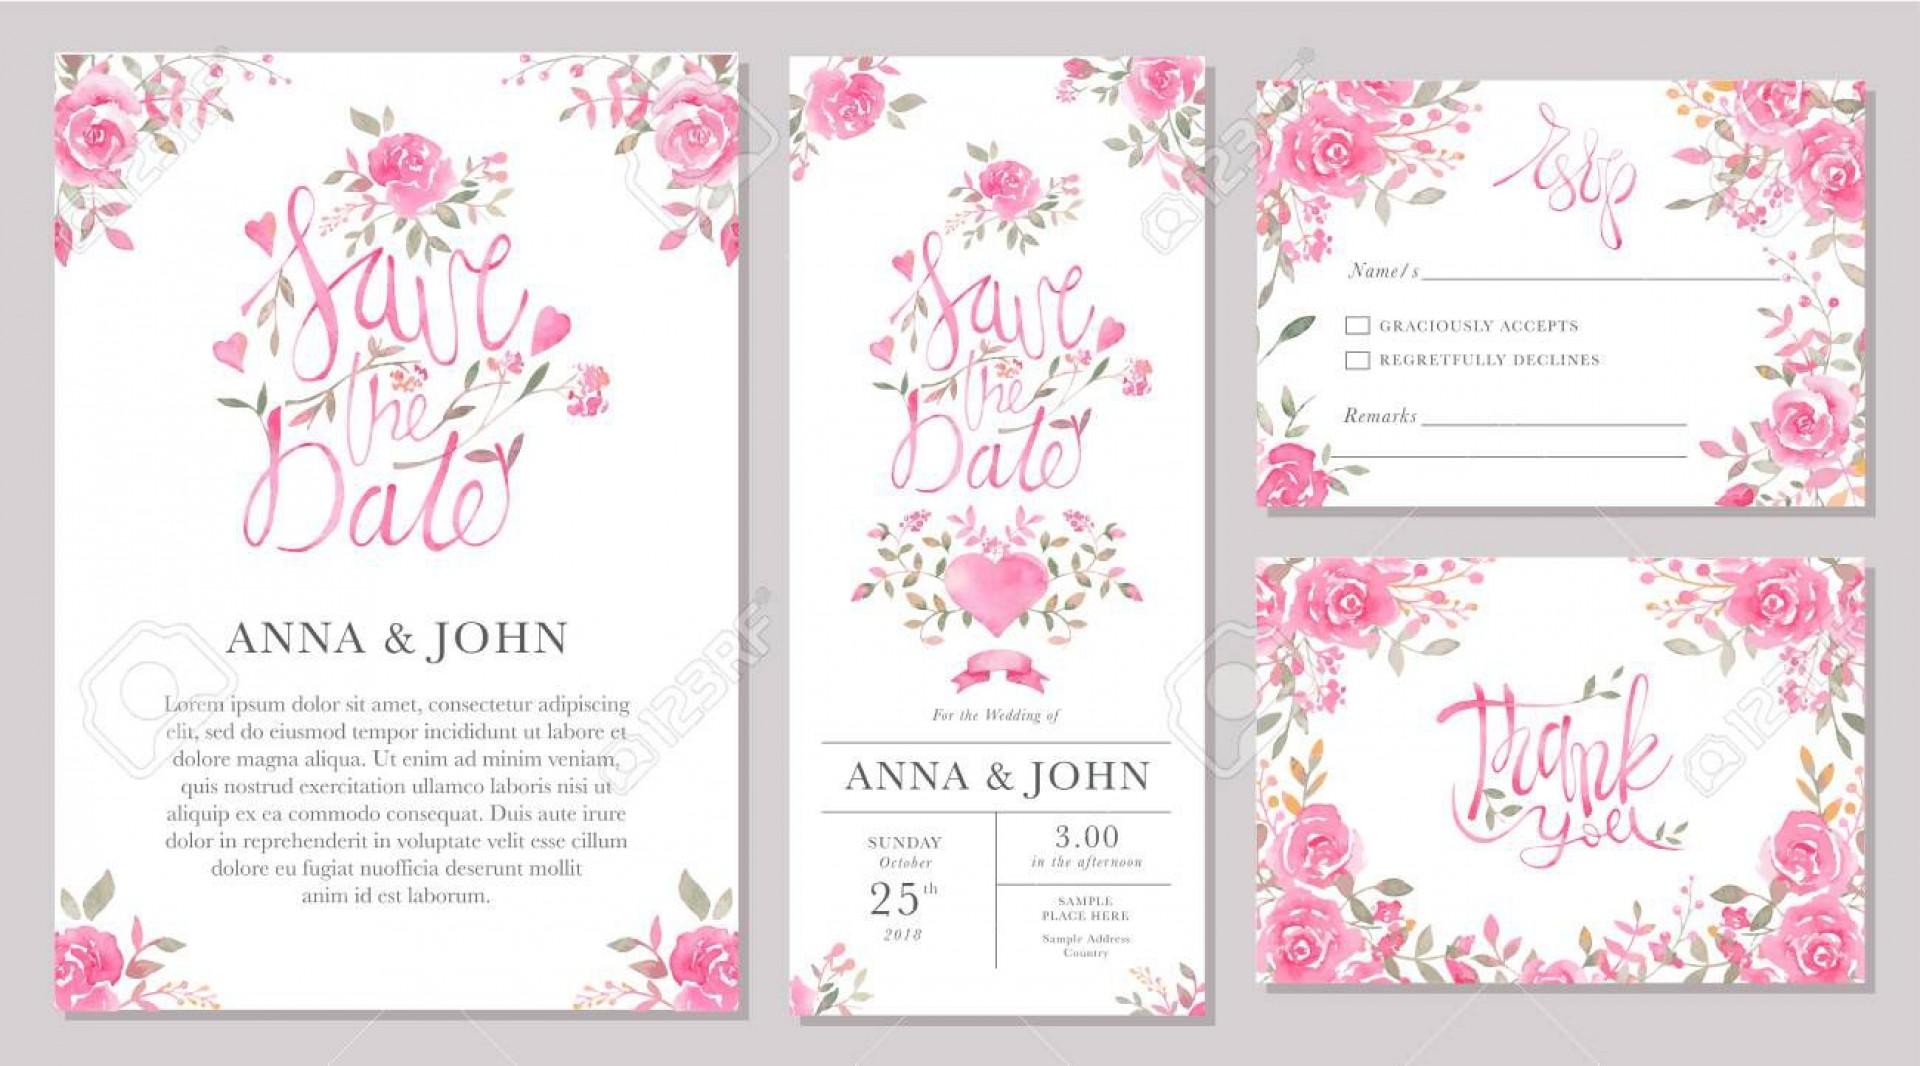 003 Formidable Sample Wedding Invitation Card Template Inspiration  Templates Free Design Response Wording1920